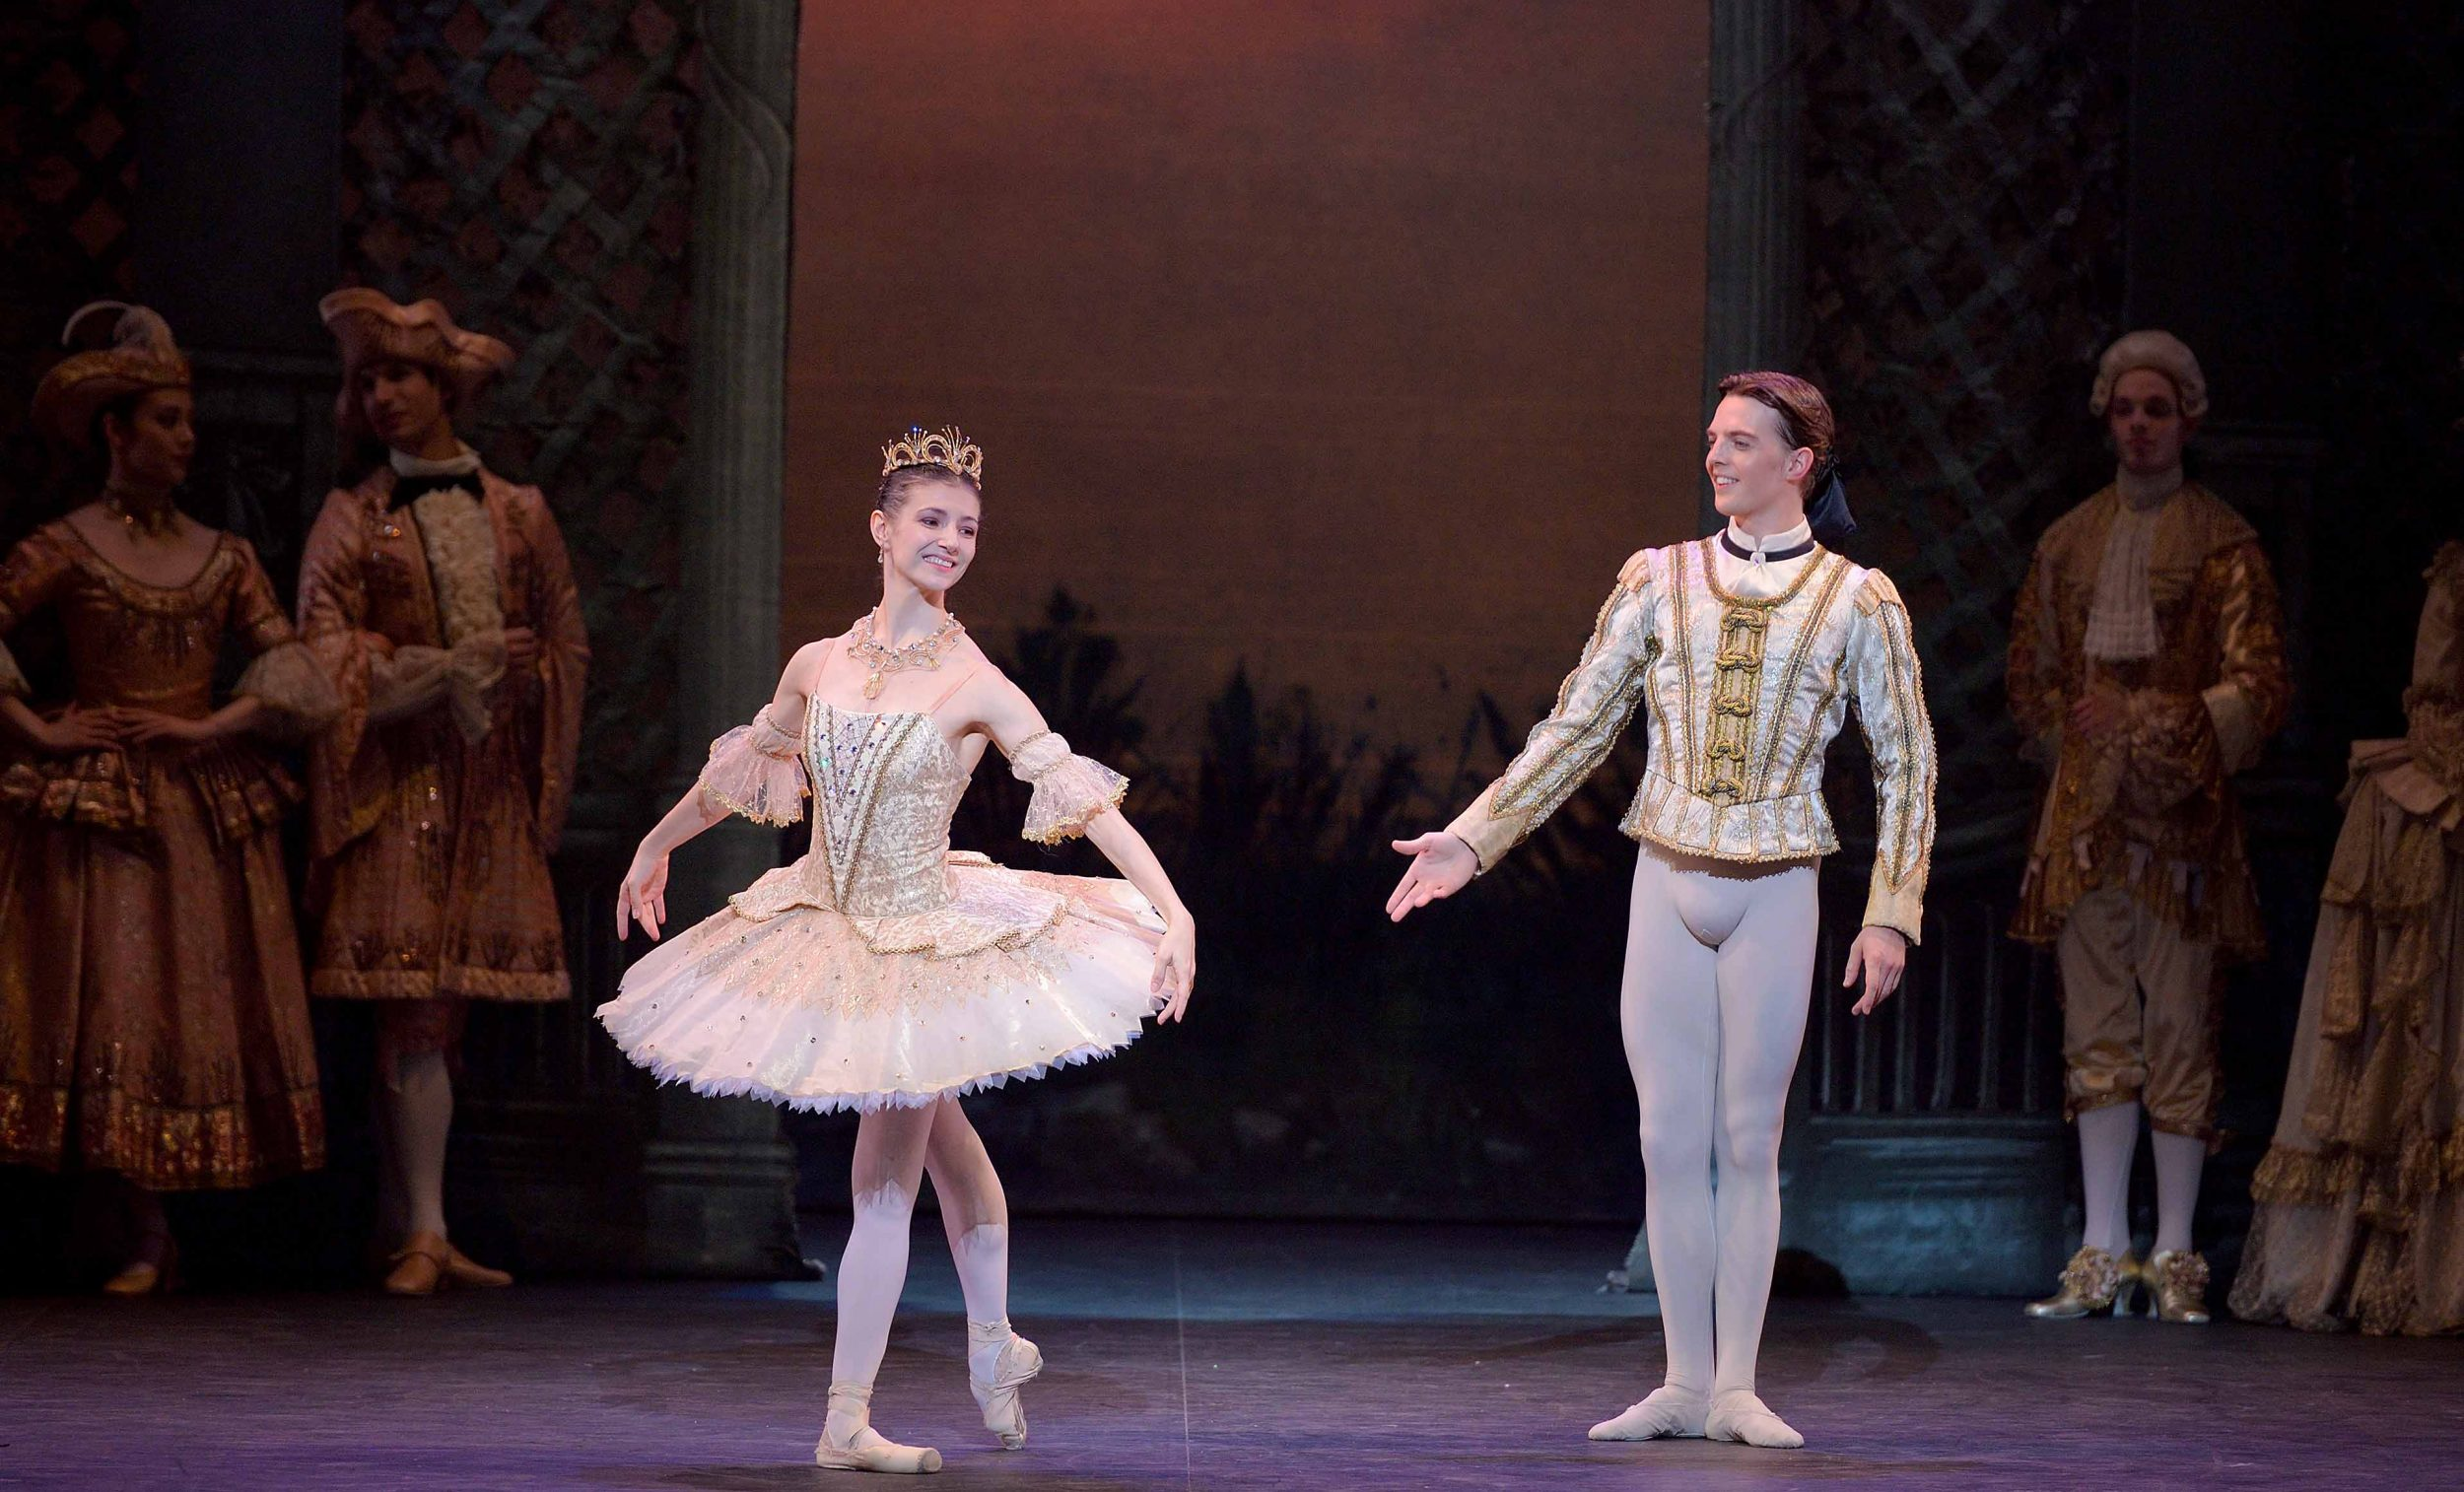 Alina-Cojocaru-as-Princess-Aurora-and-Joseph-Caley-as-Prince-Désiré-in-The-Sleeping-Beauty-©-Laurent-Liotardo-(2)_WEB